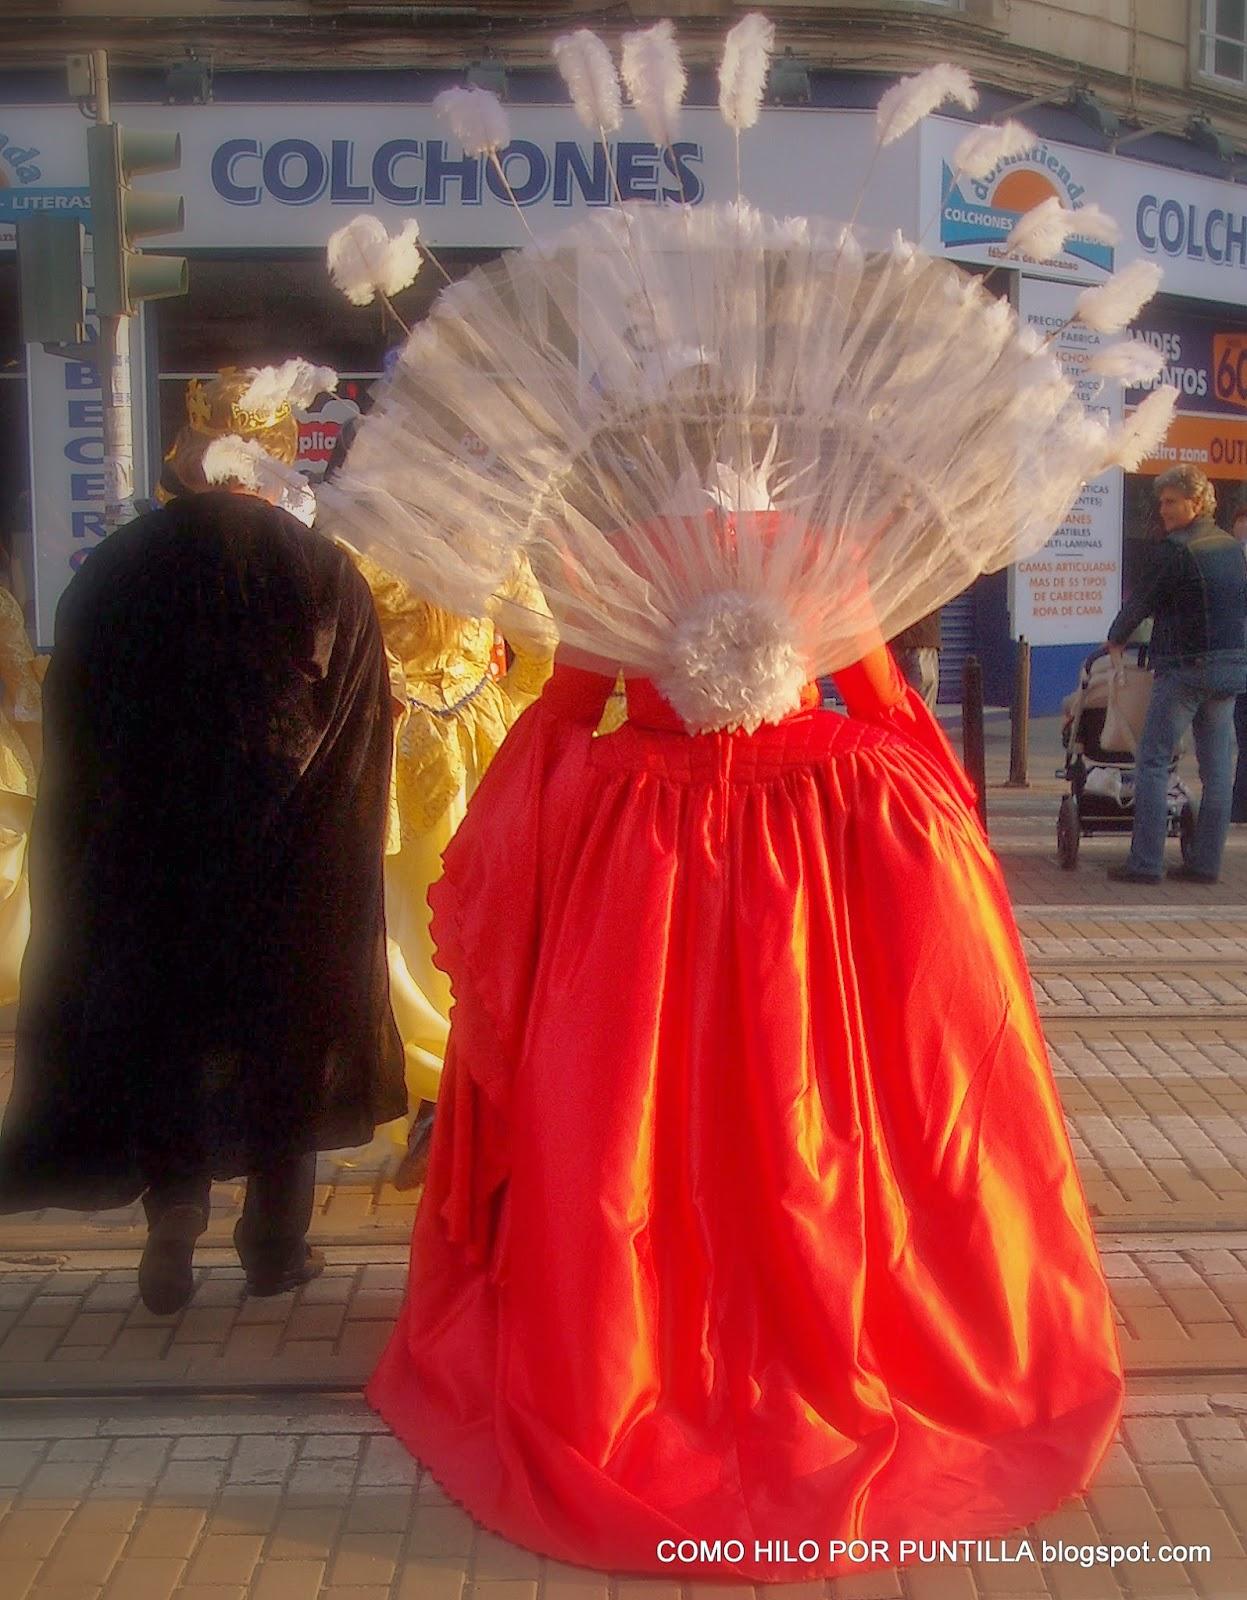 Mirror_Mirror_costume_red_dress